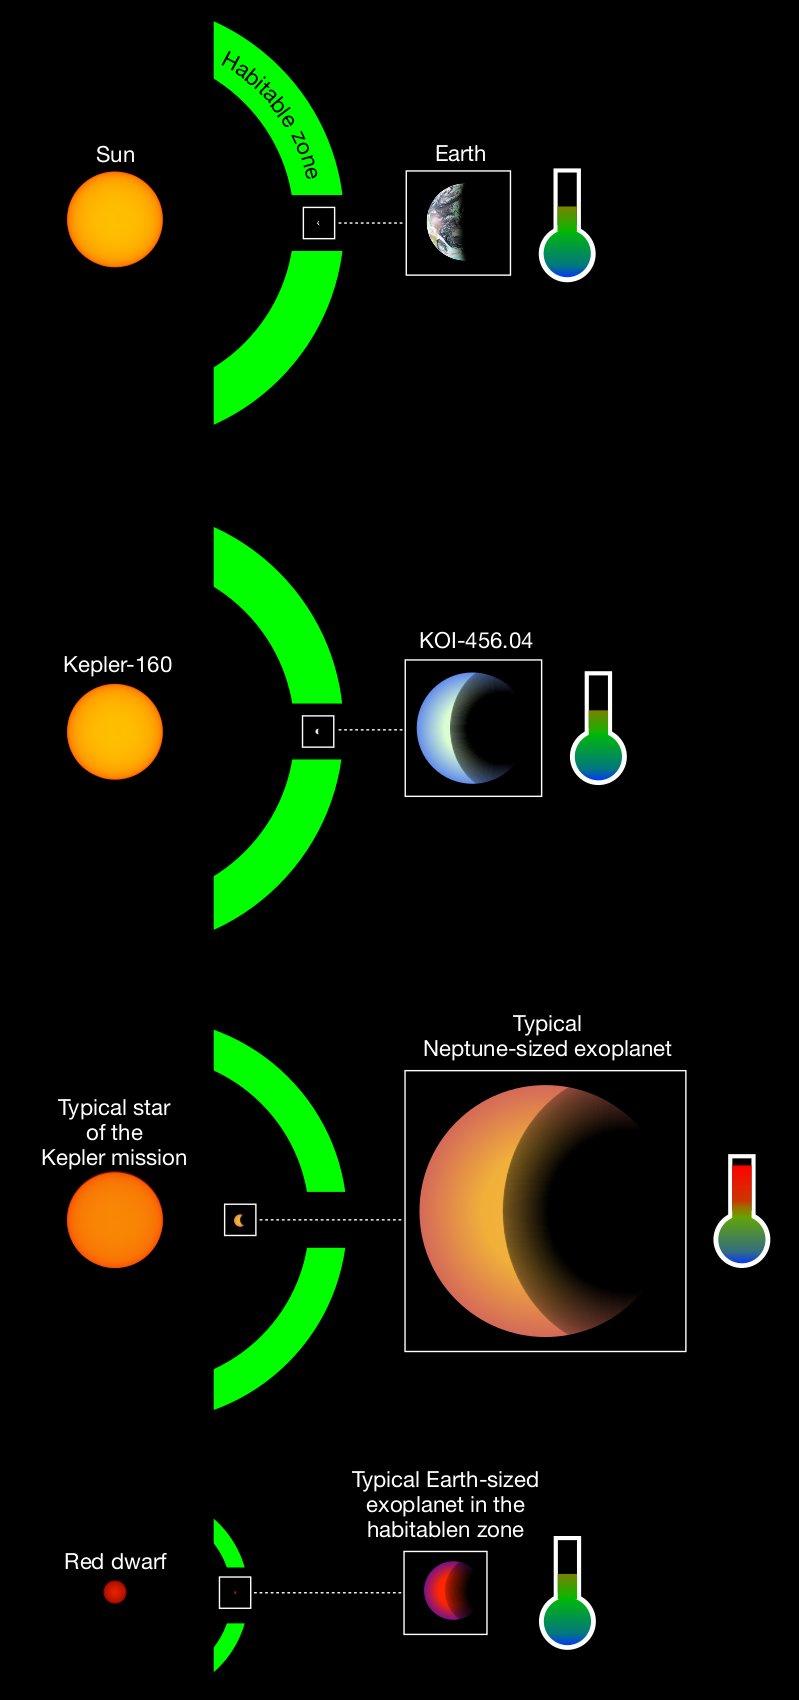 A faint resemblance of Sun and Earth